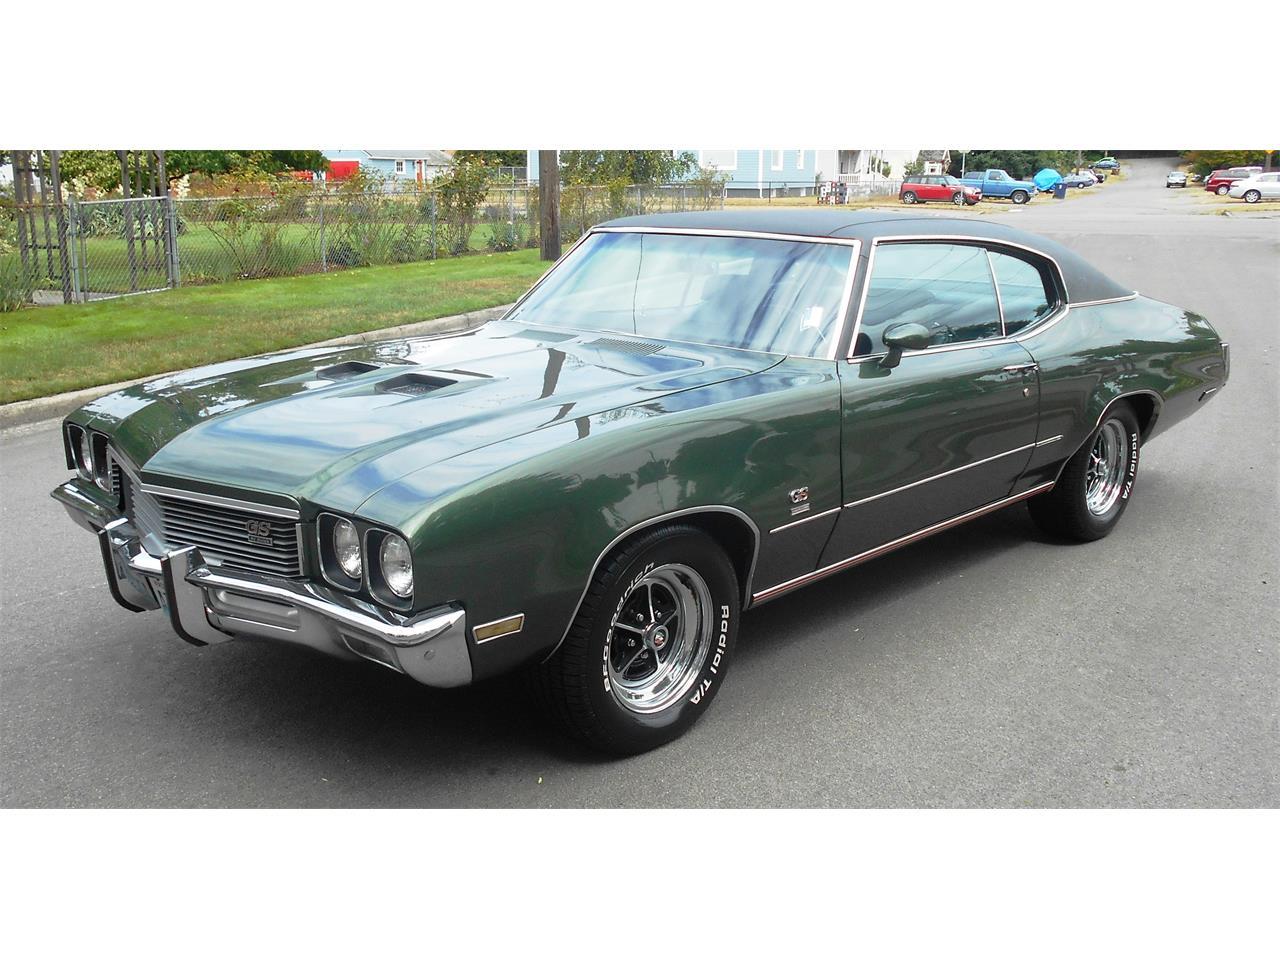 1972 Buick Gran Sport (CC-1239616) for sale in Tacoma, Washington